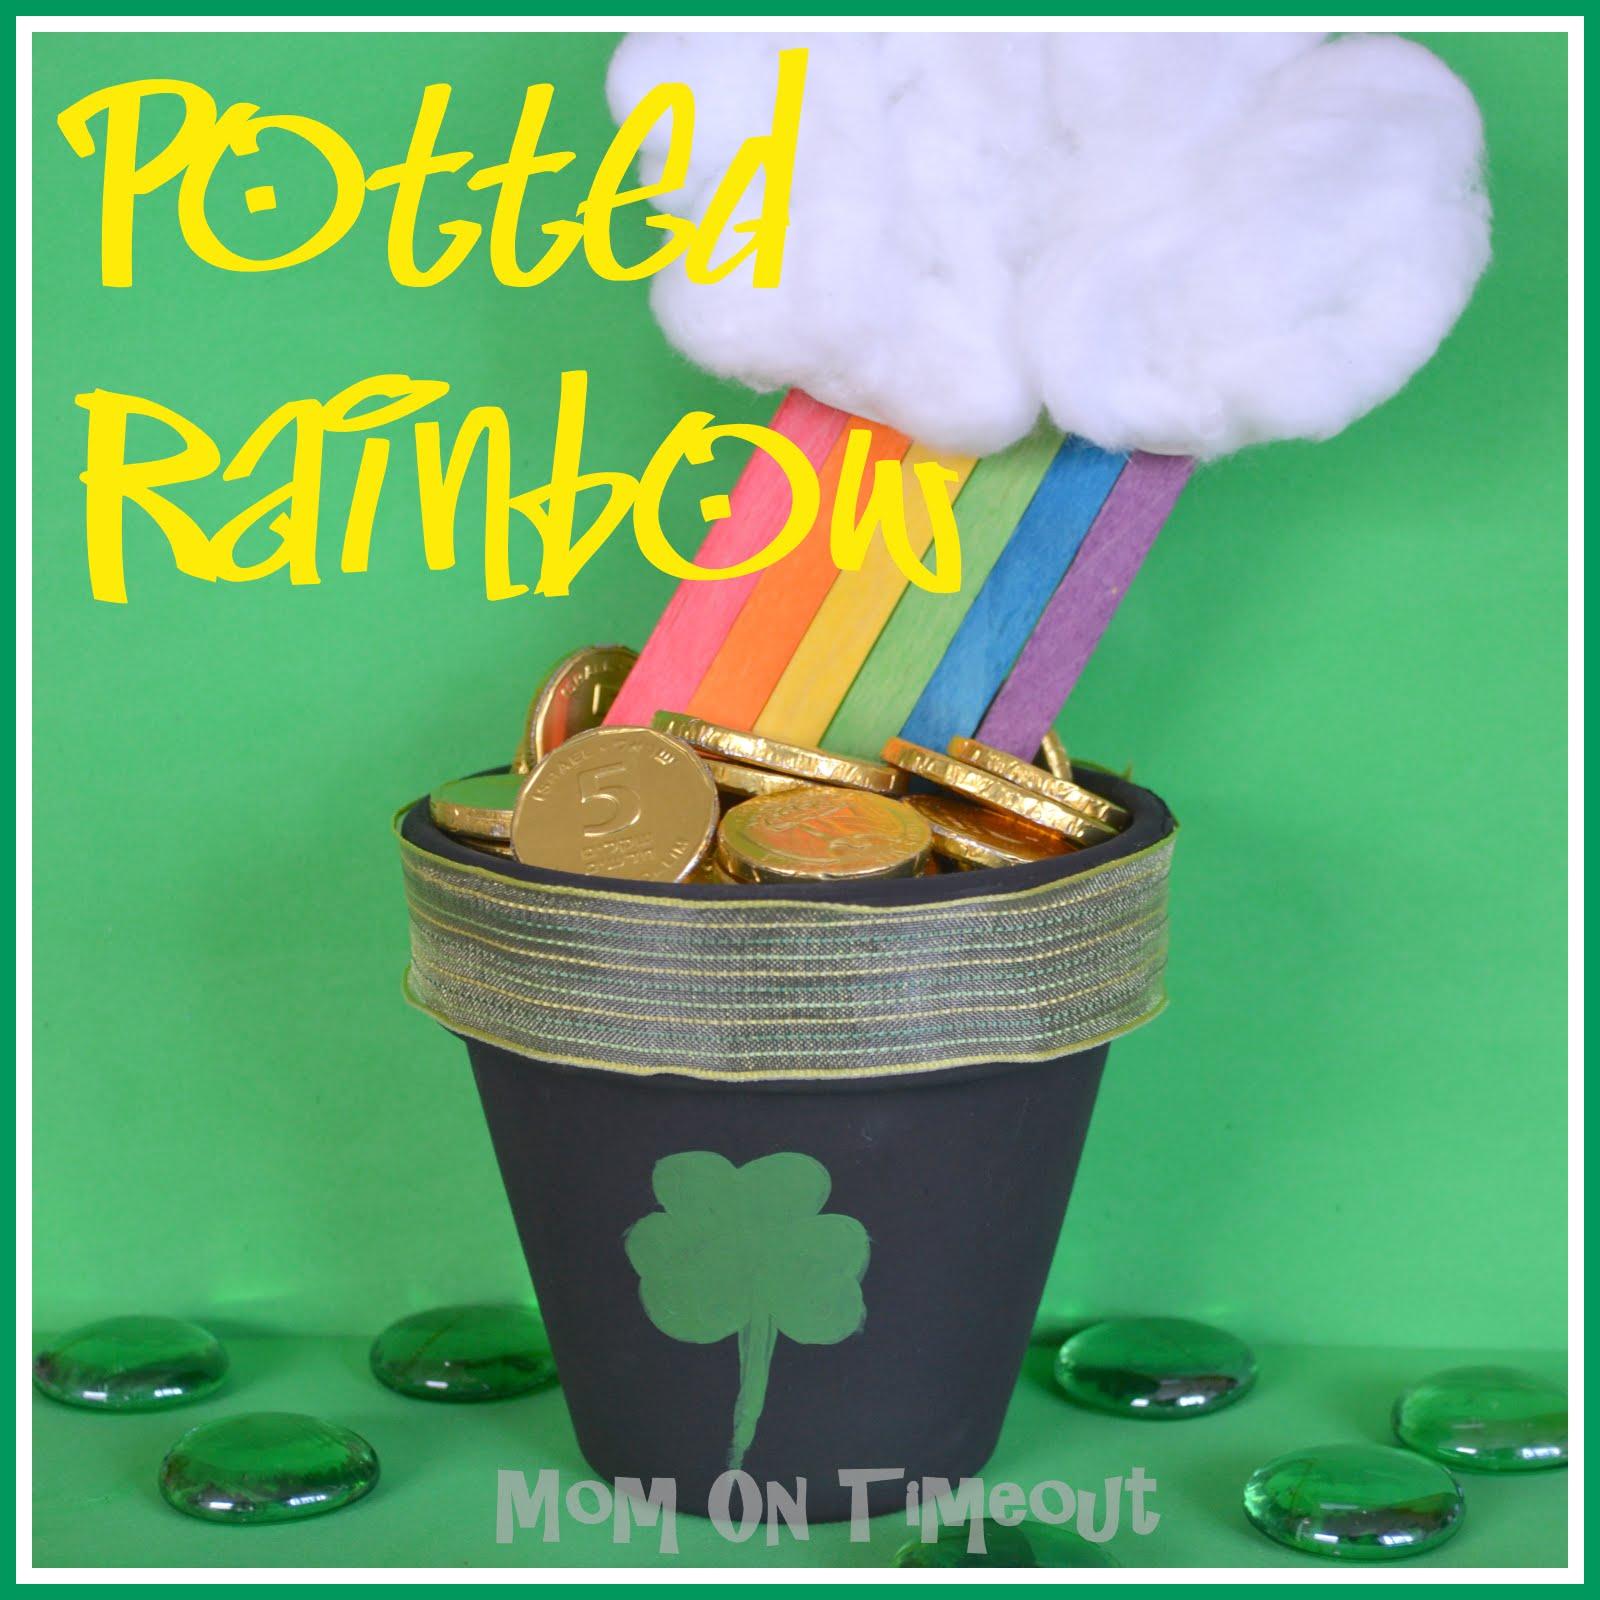 Potted Rainbow